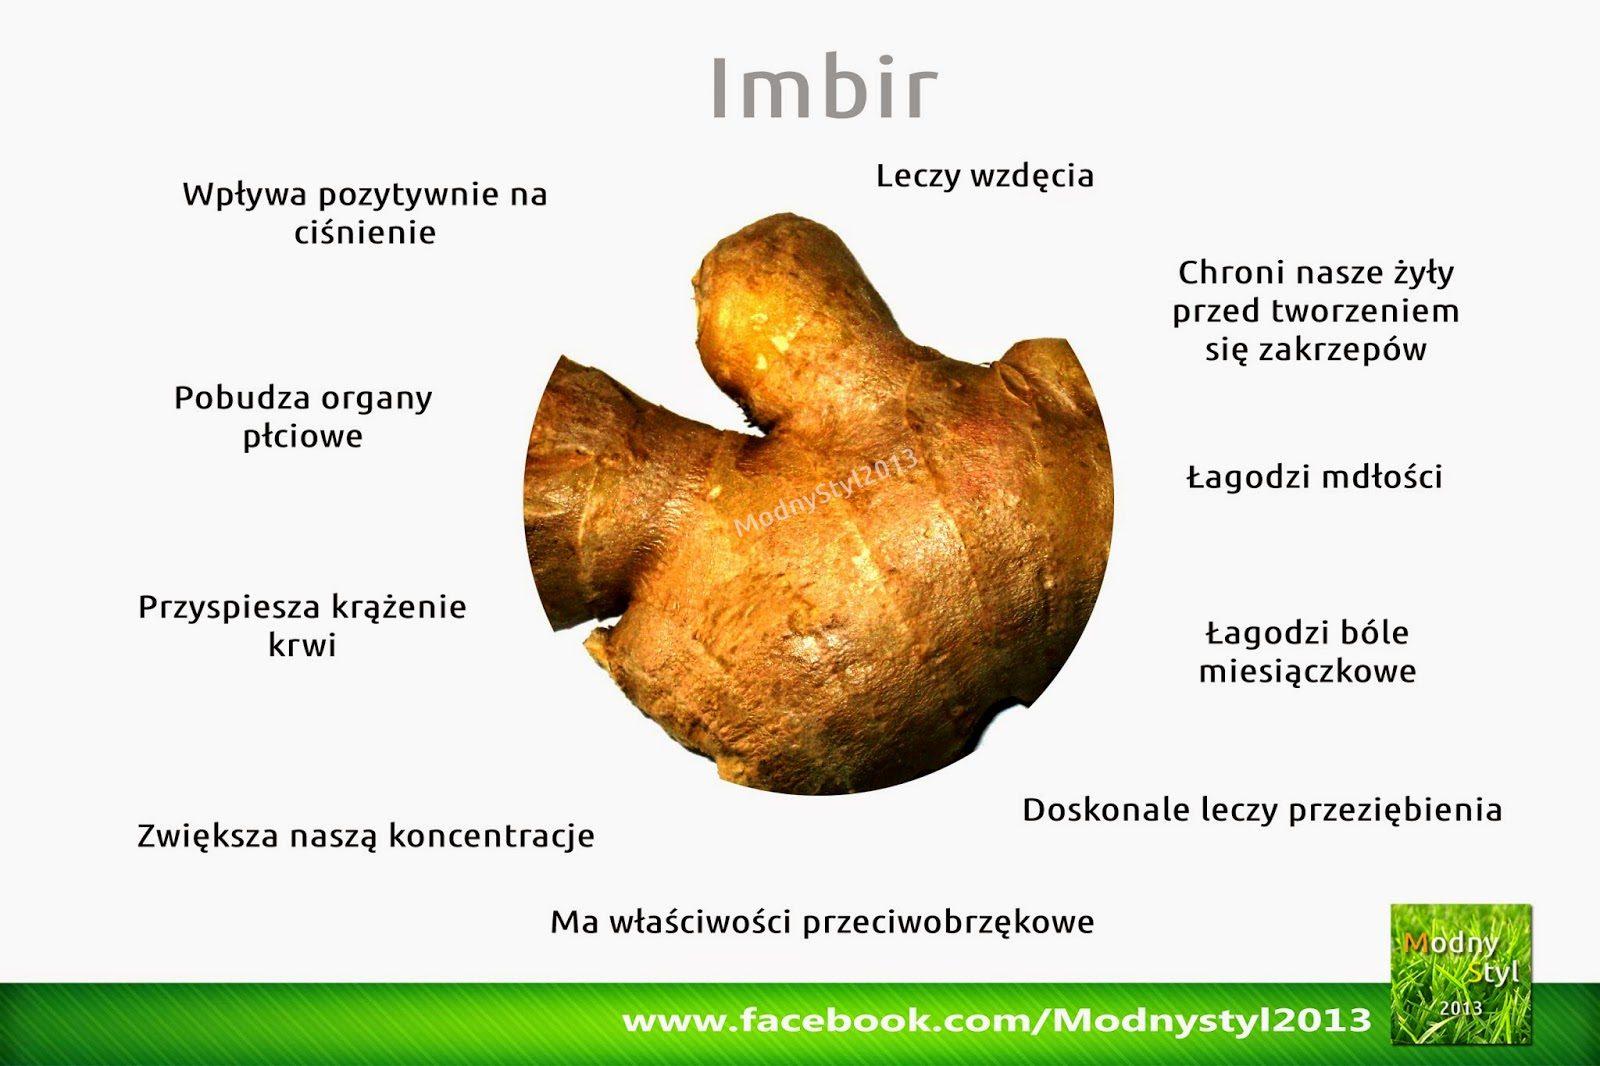 imbir-5764379